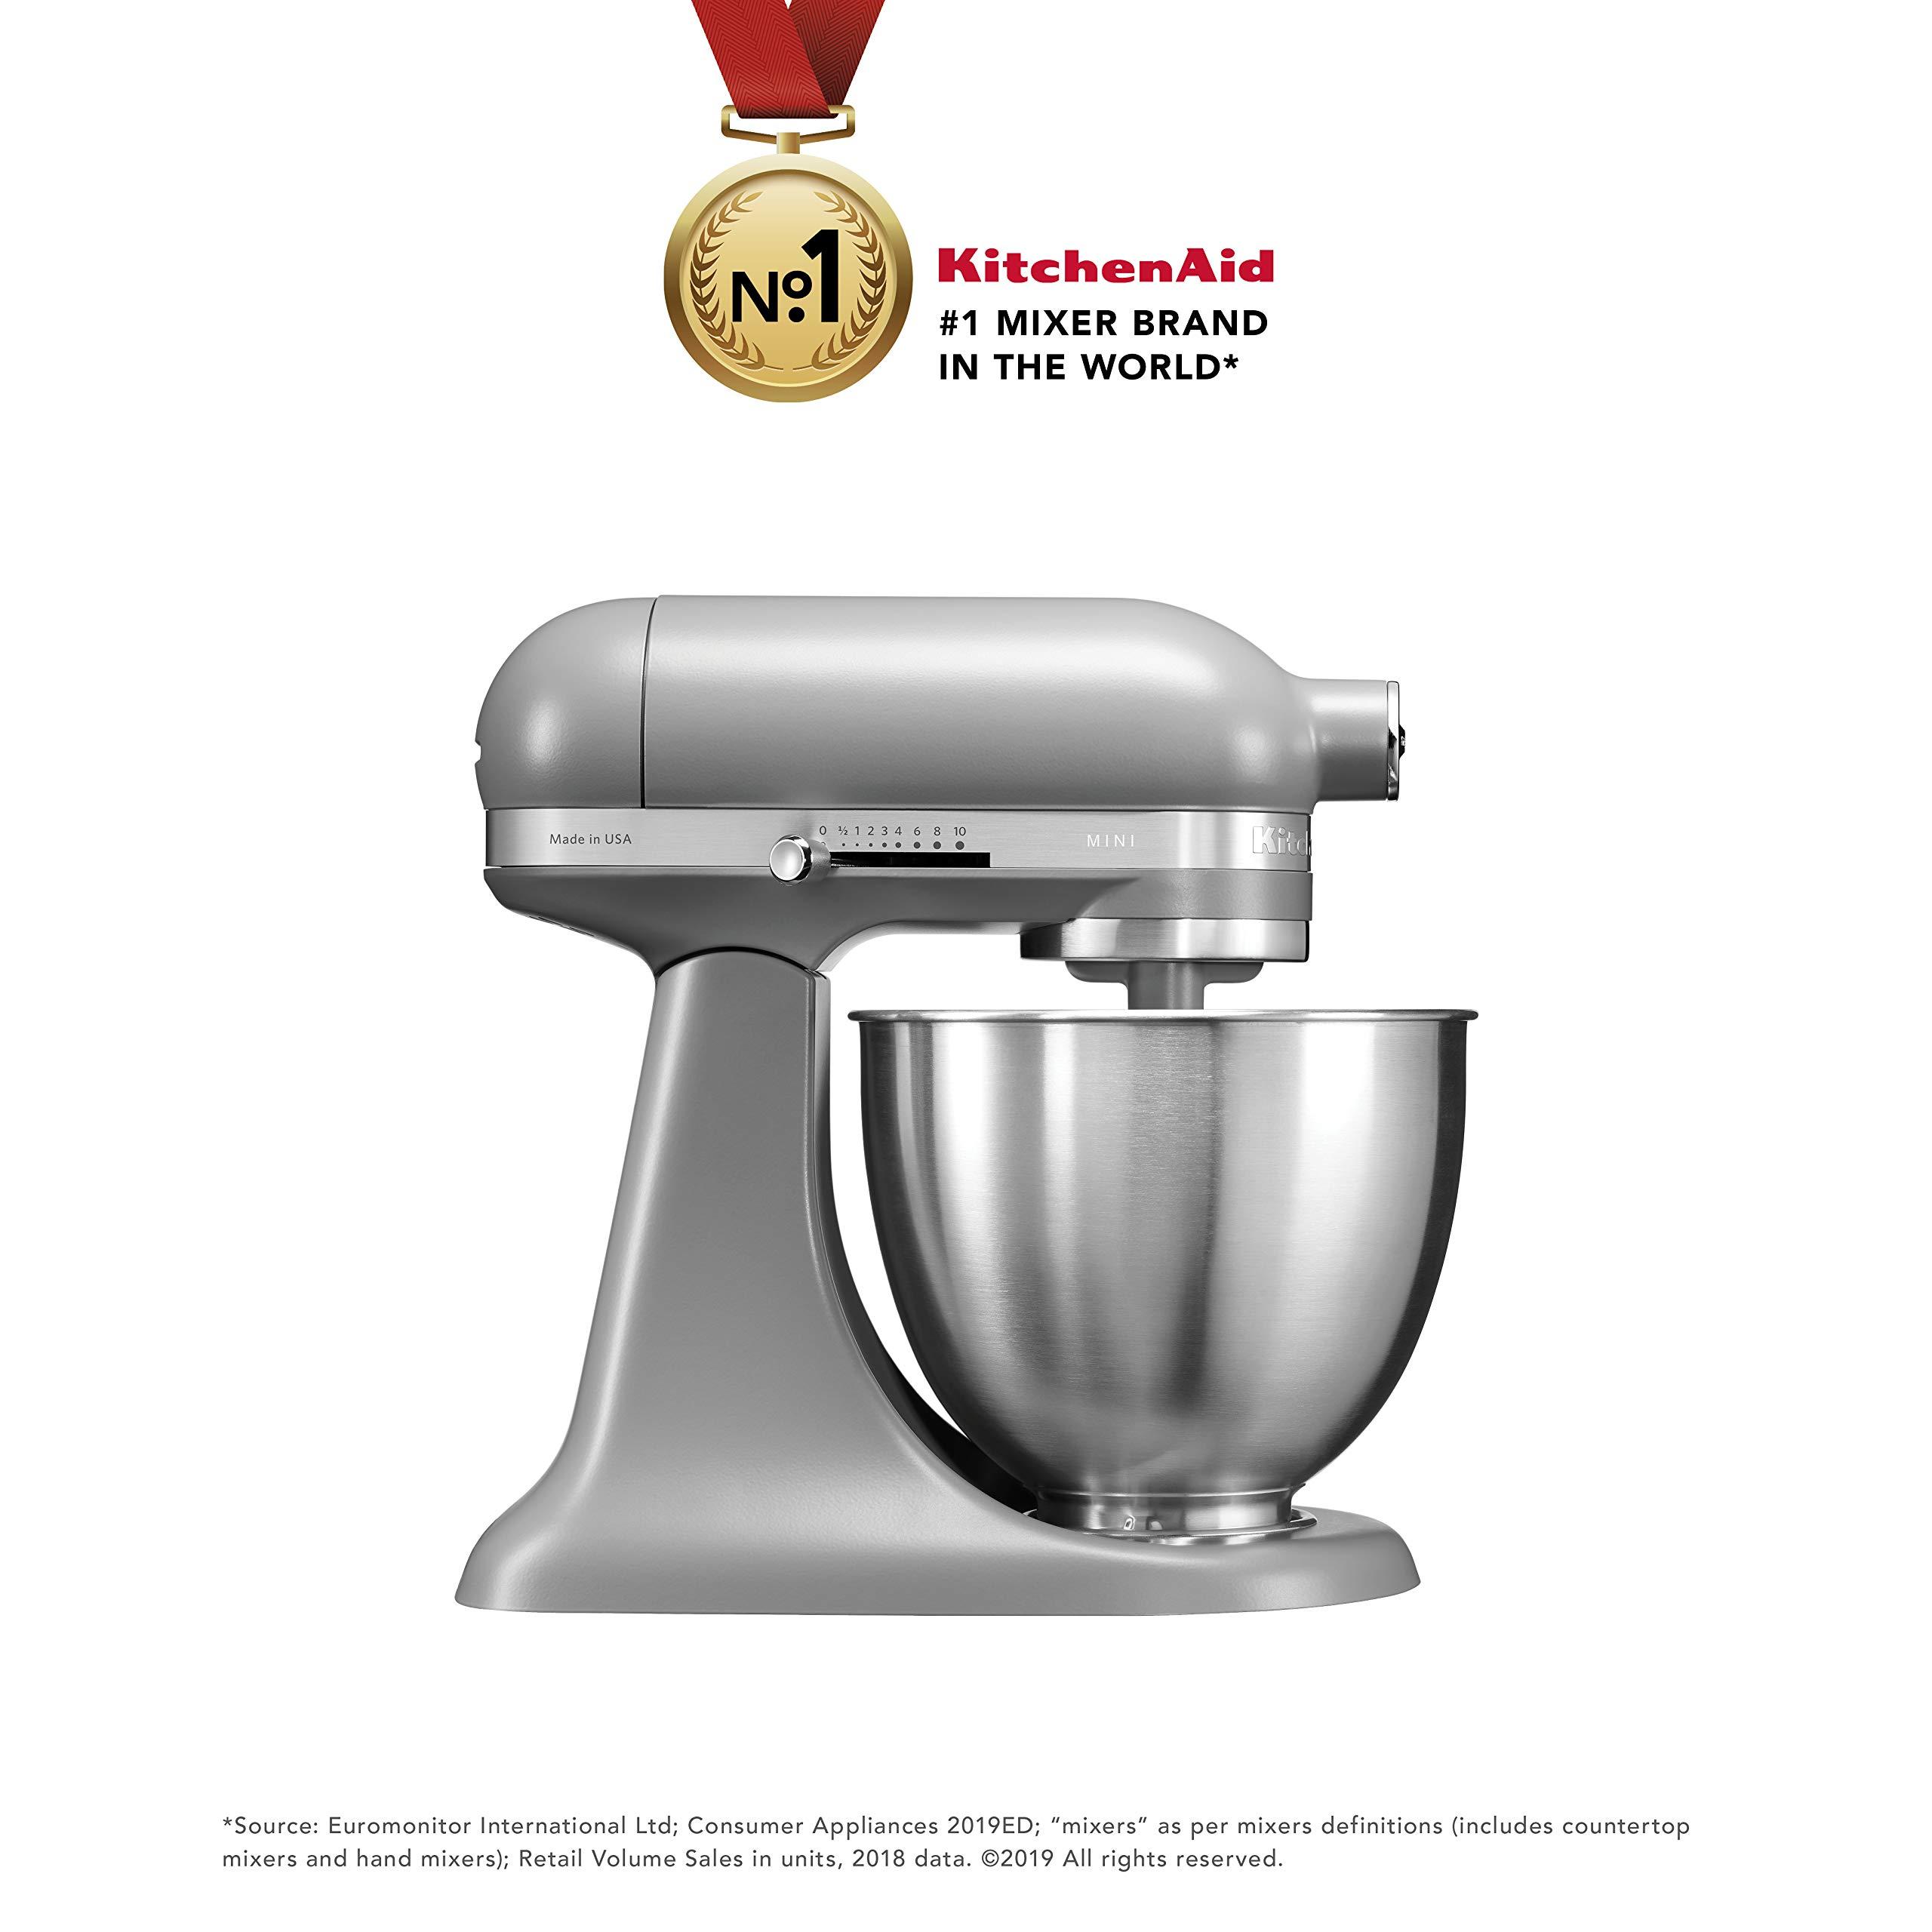 Kitchenaid Artisan Series 5ksm3311xbfg 250 Watt 3 3 Litre Mini Stand Mixer Matte Grey Buy Online In Faroe Islands At Faroe Desertcart Com Productid 75812480